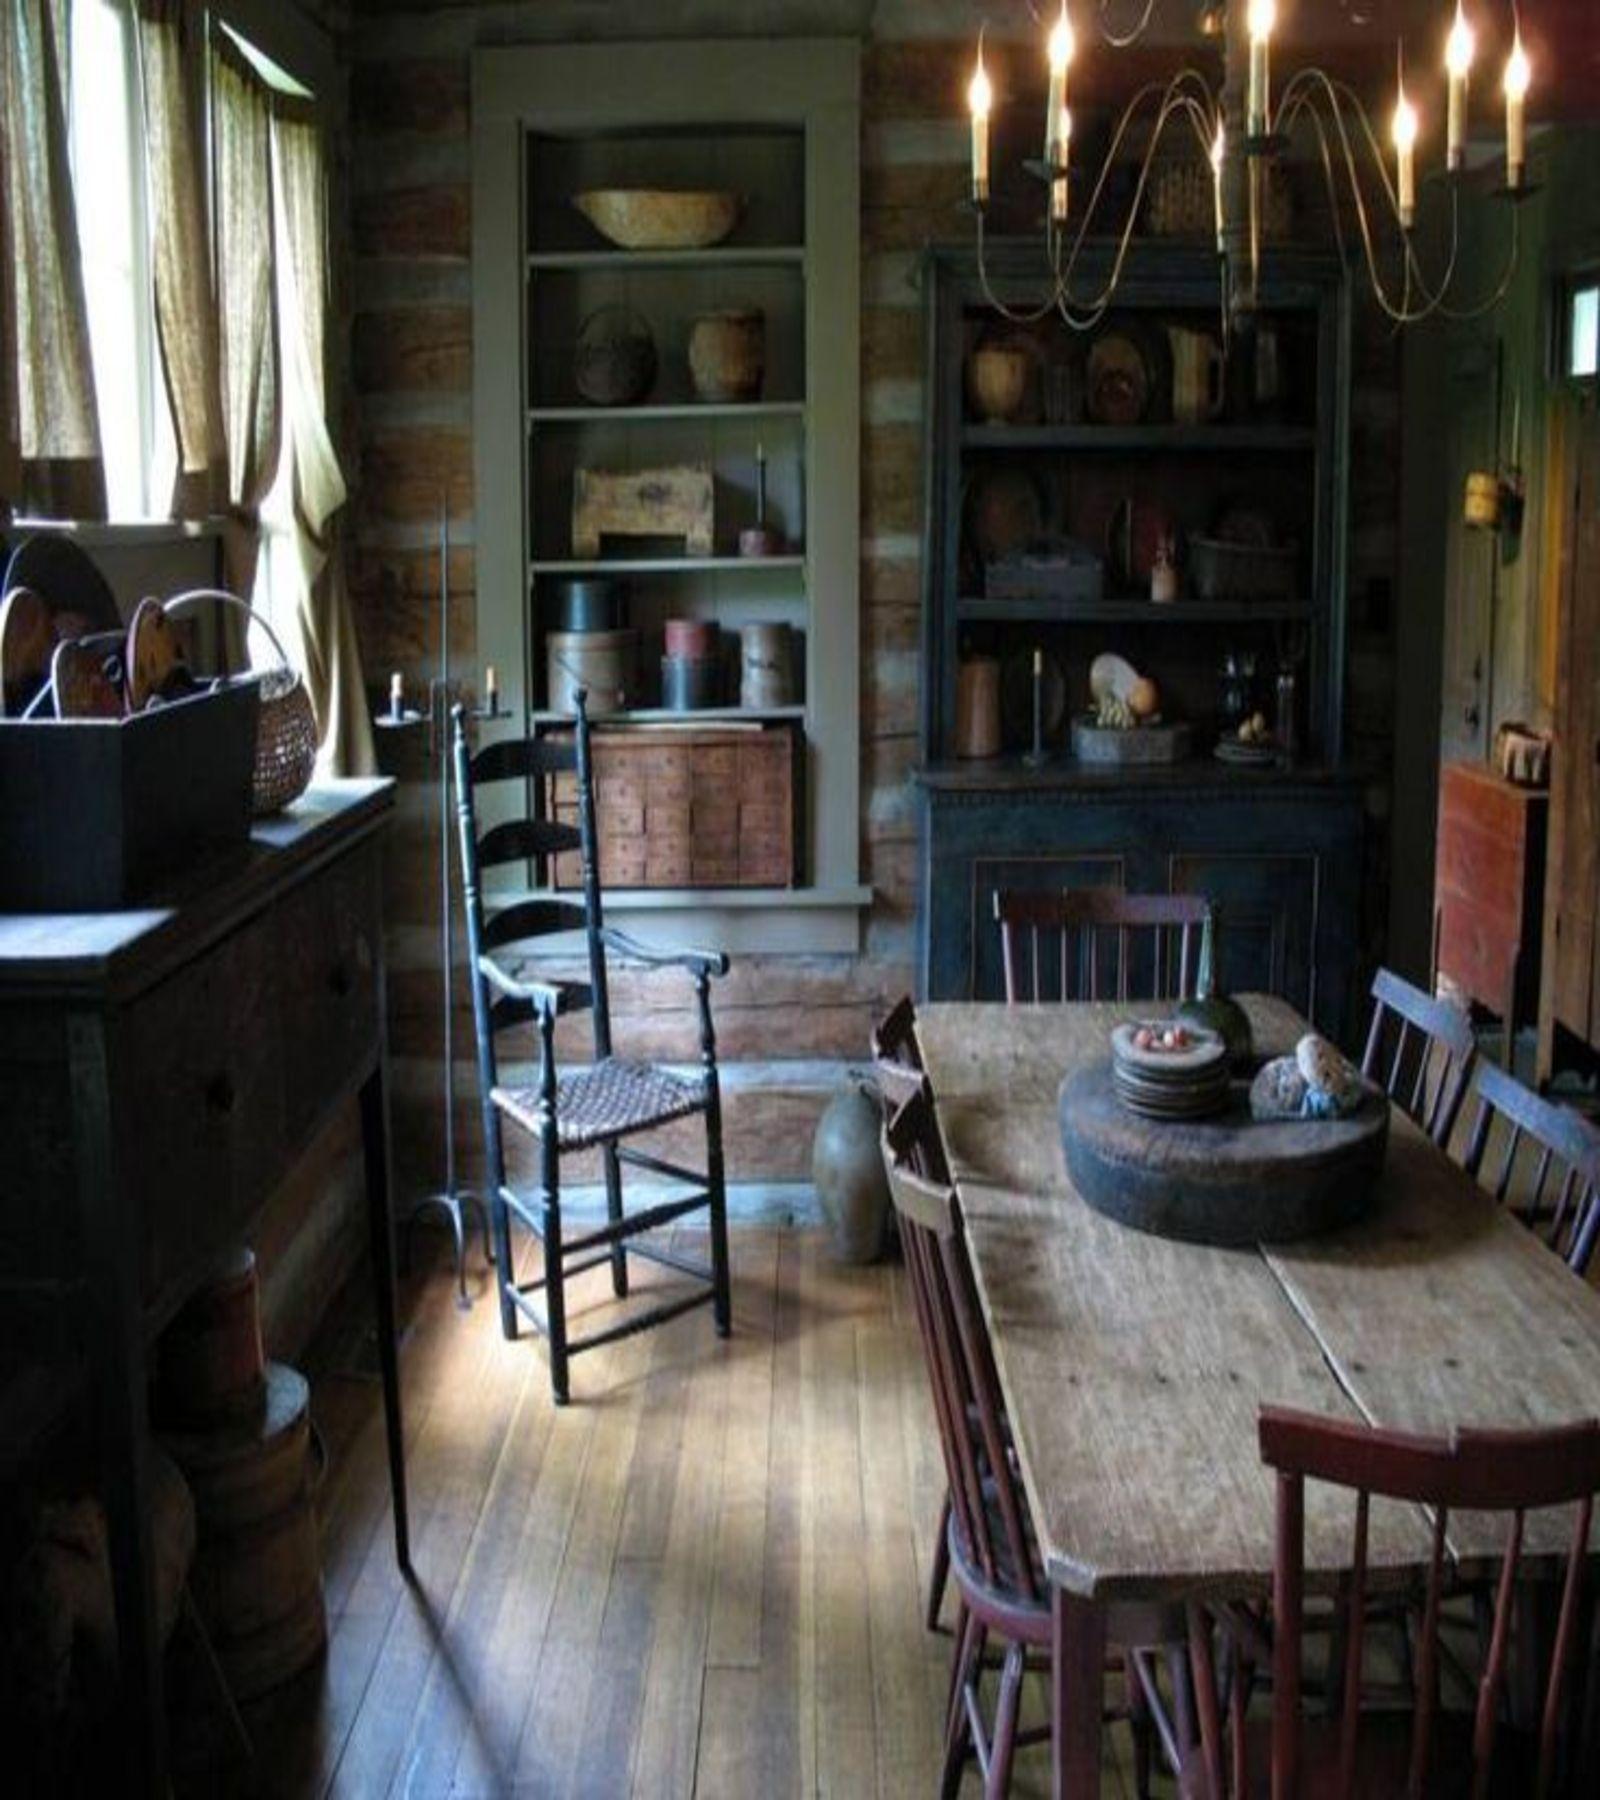 Primitive Dining Room Furniture: Primitive Dining Room Rustic, Farmhouse, Primitive